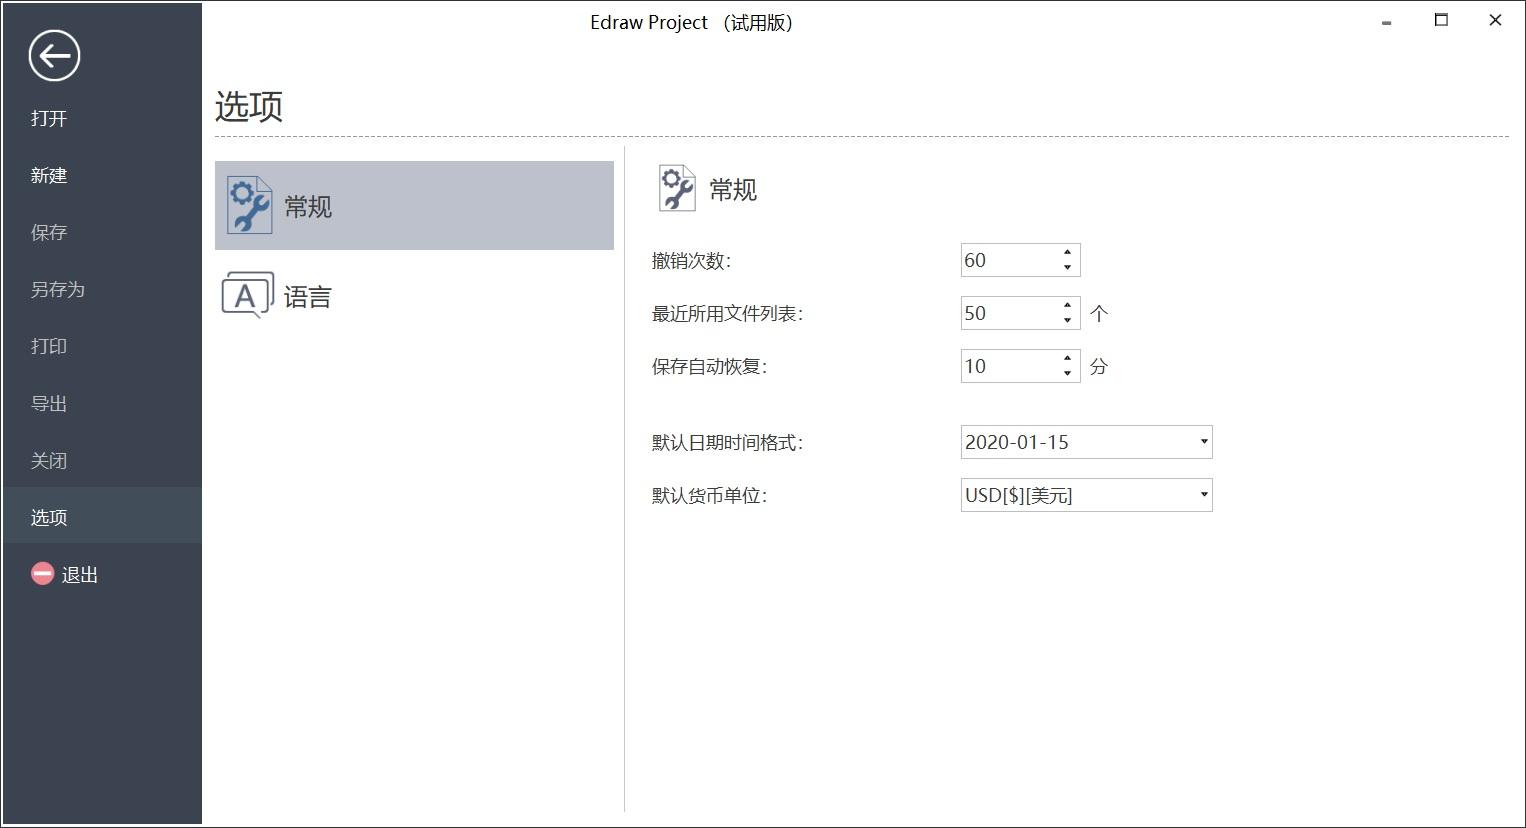 Edraw Project 破解补丁.jpg